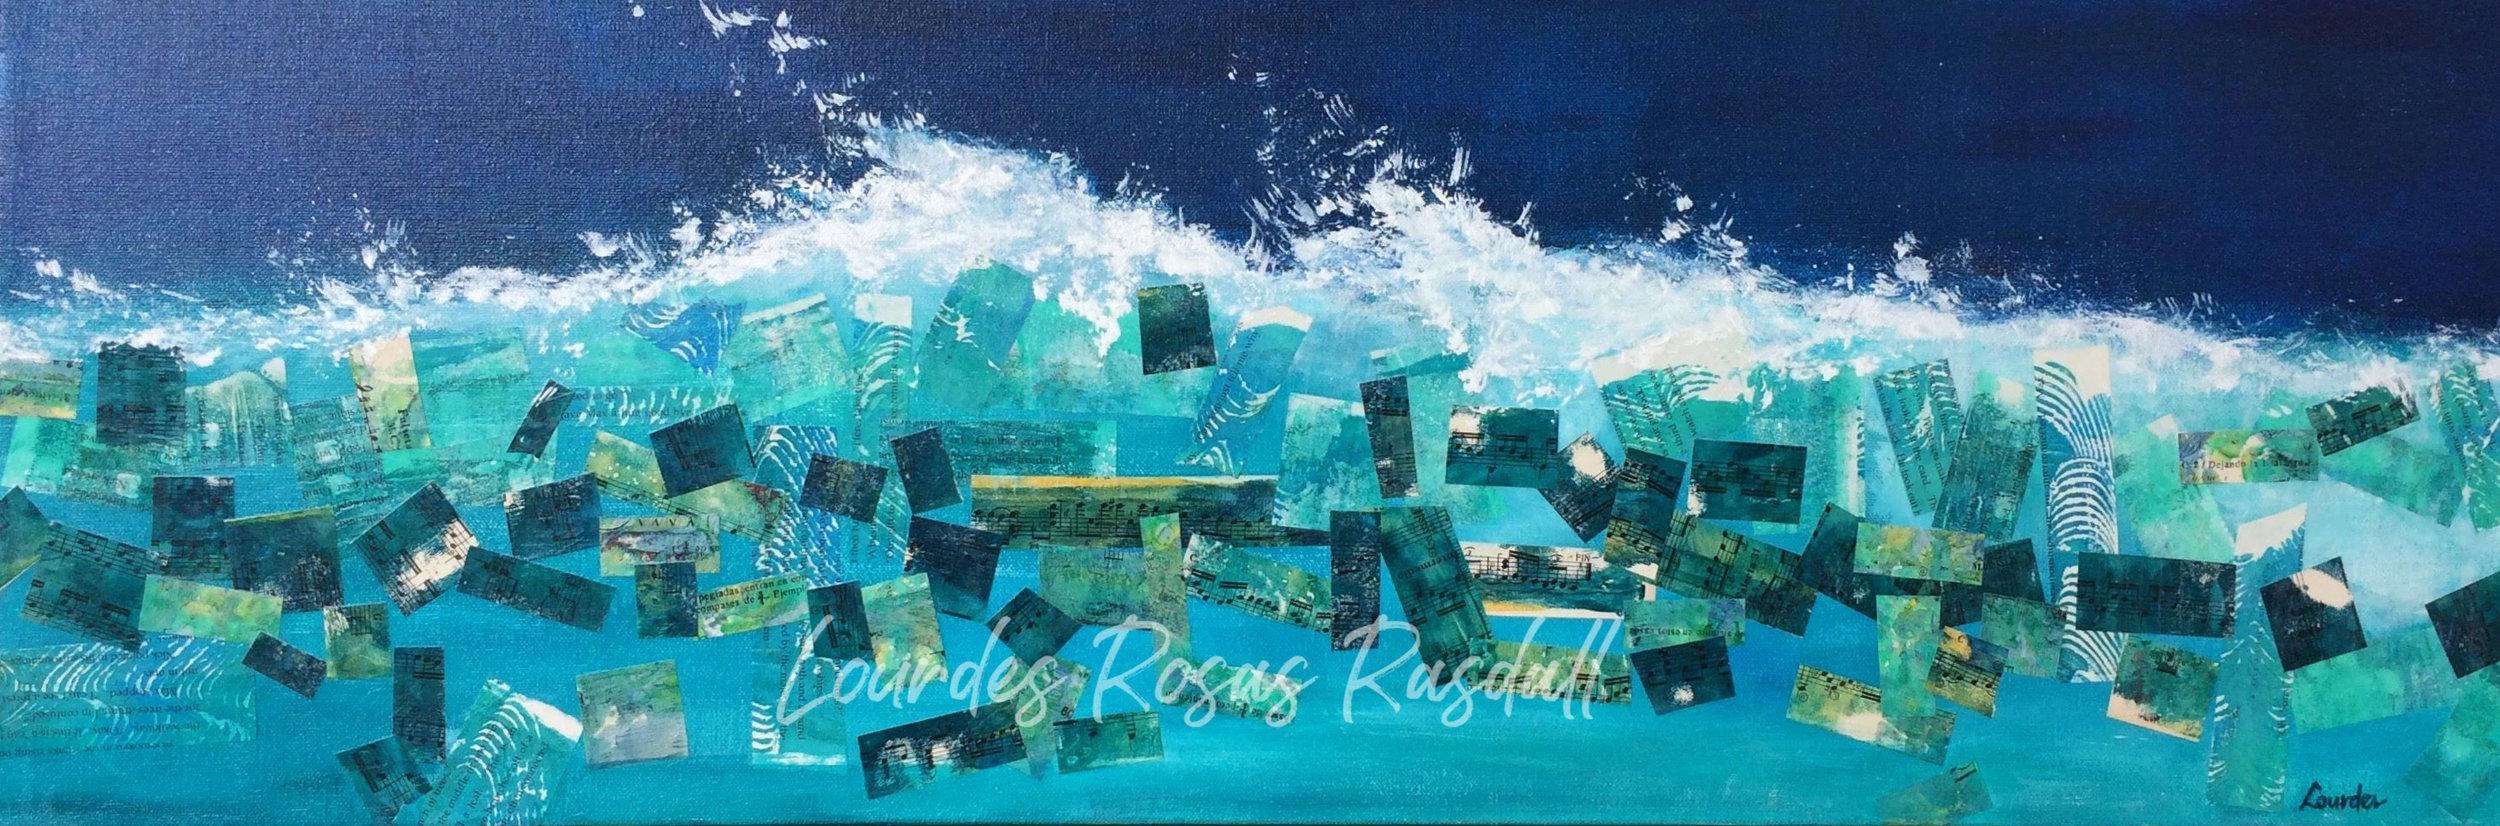 The Restless Ocean | Watercolor mixed media crashing waves artwork